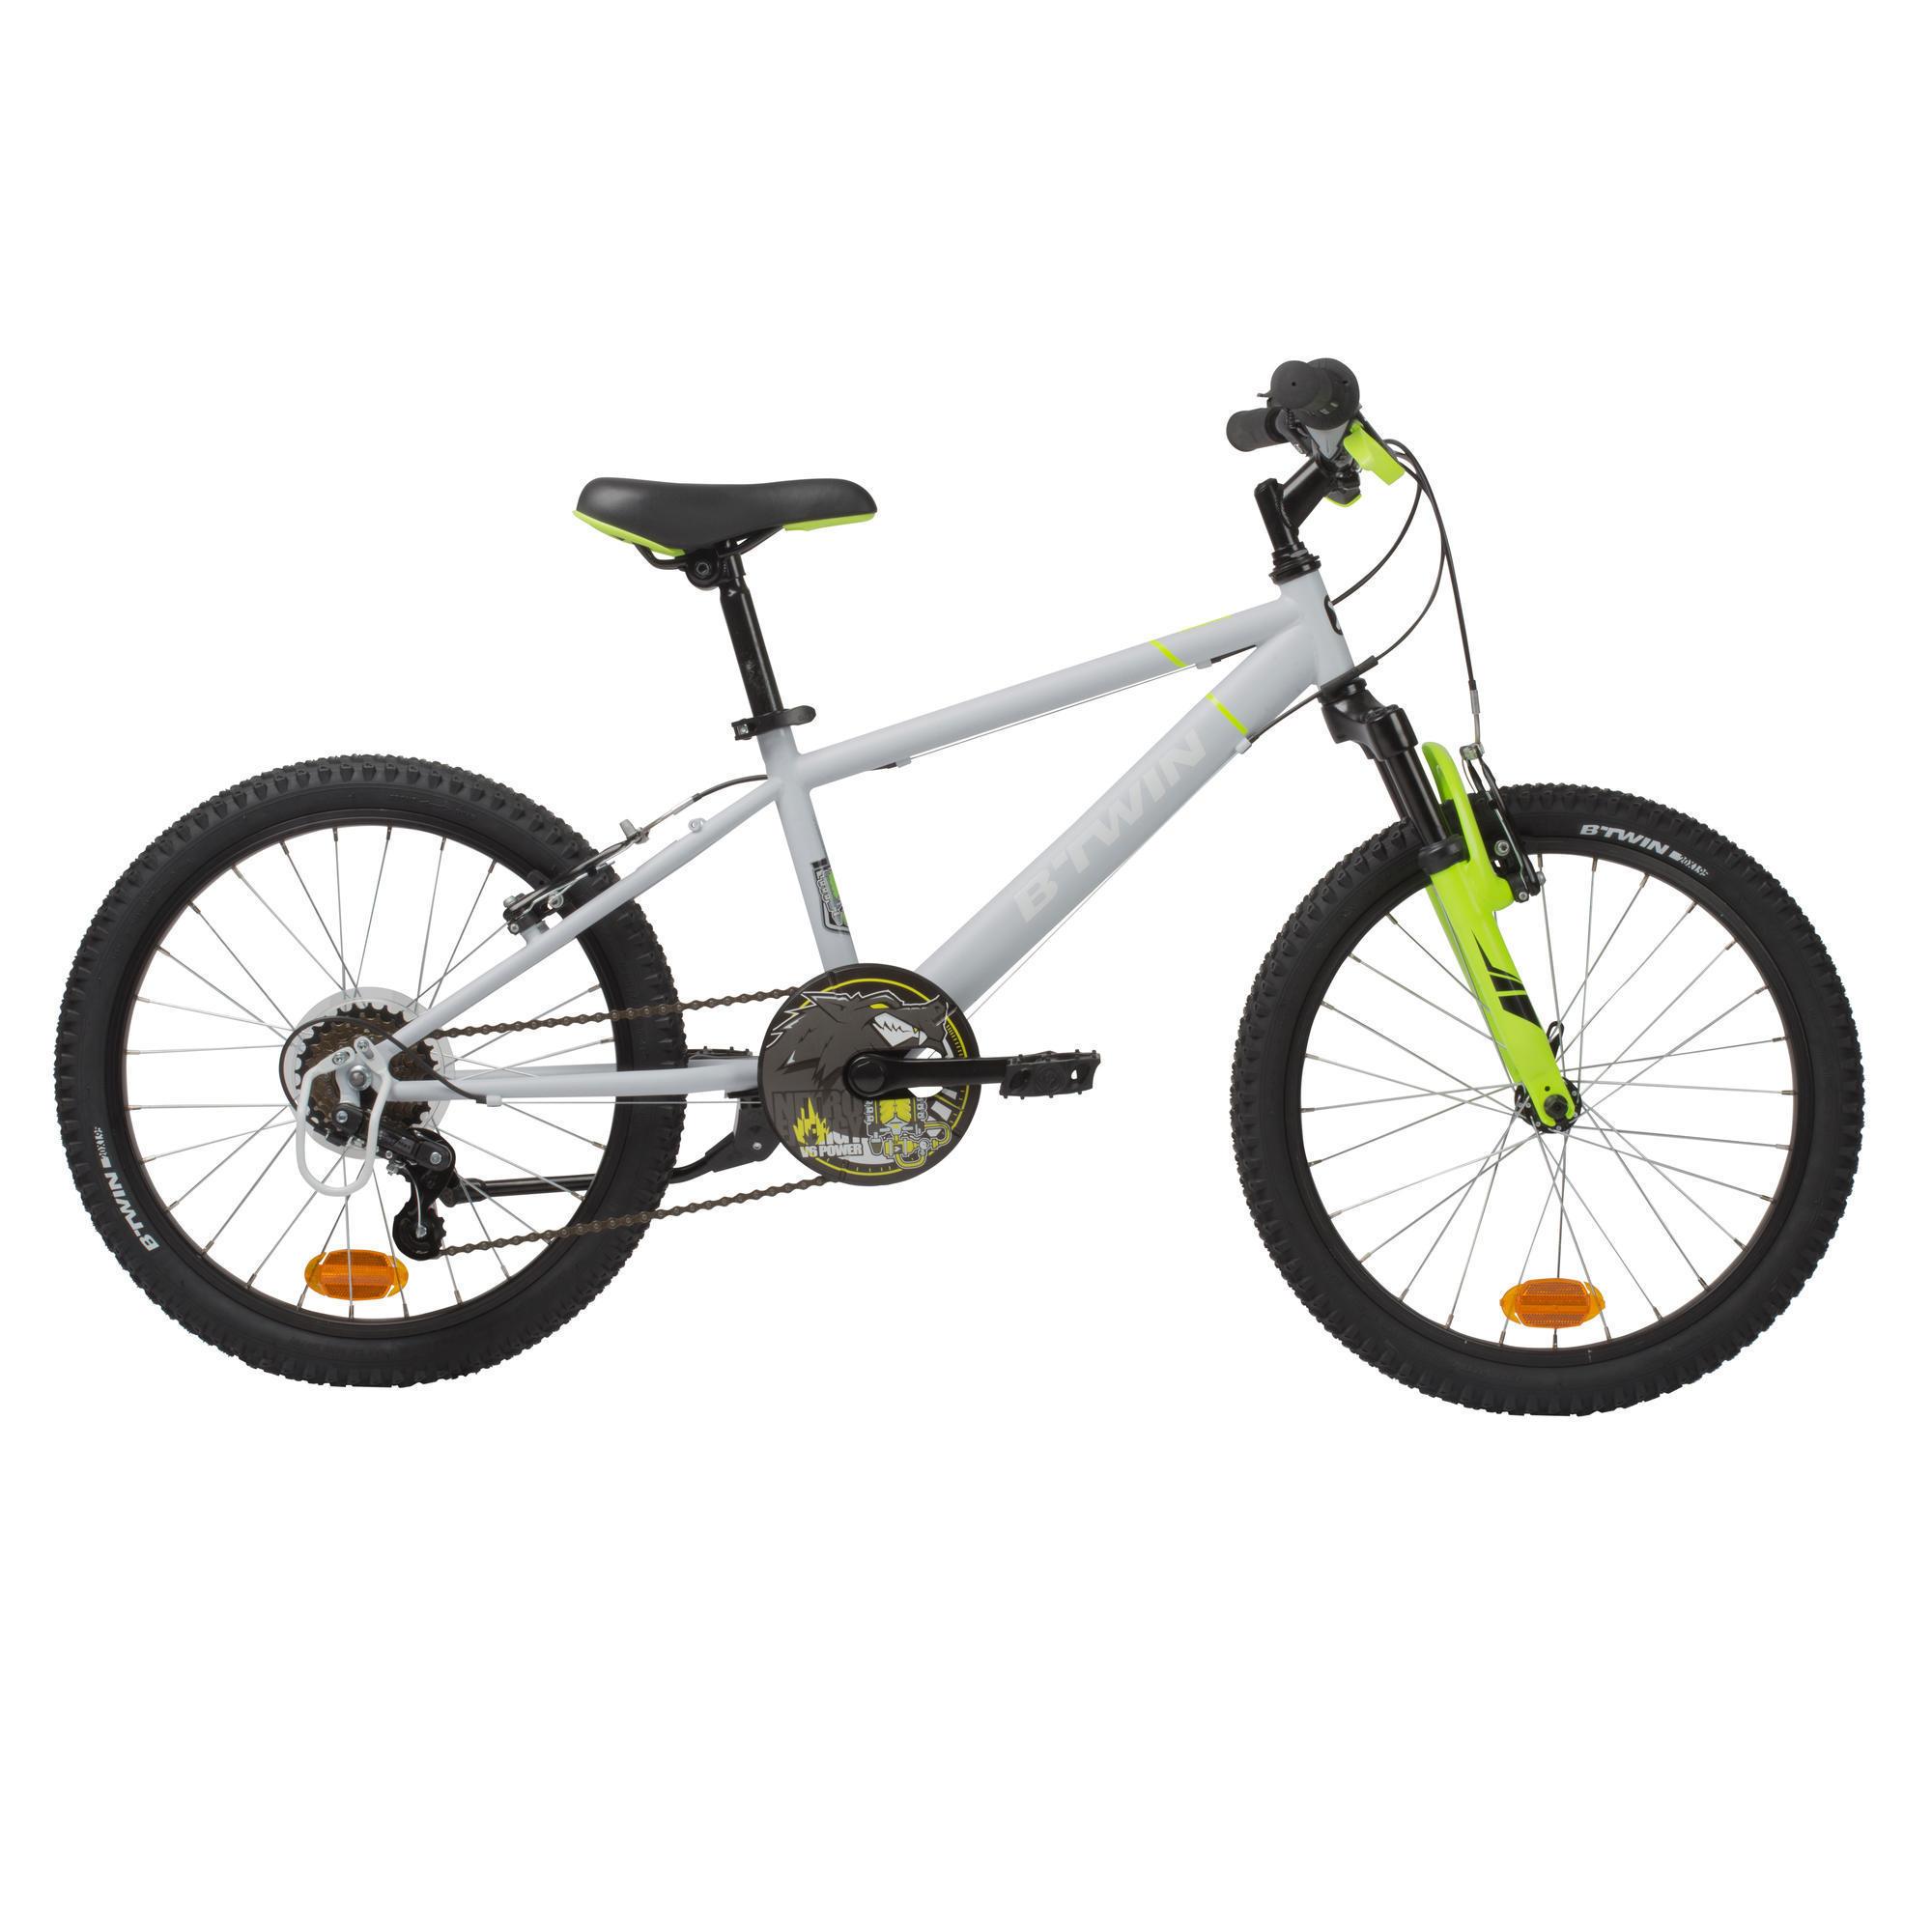 B'twin Kinder mountainbike Racing 500 20 inch jongensfiets 1.20 tot 1.35m